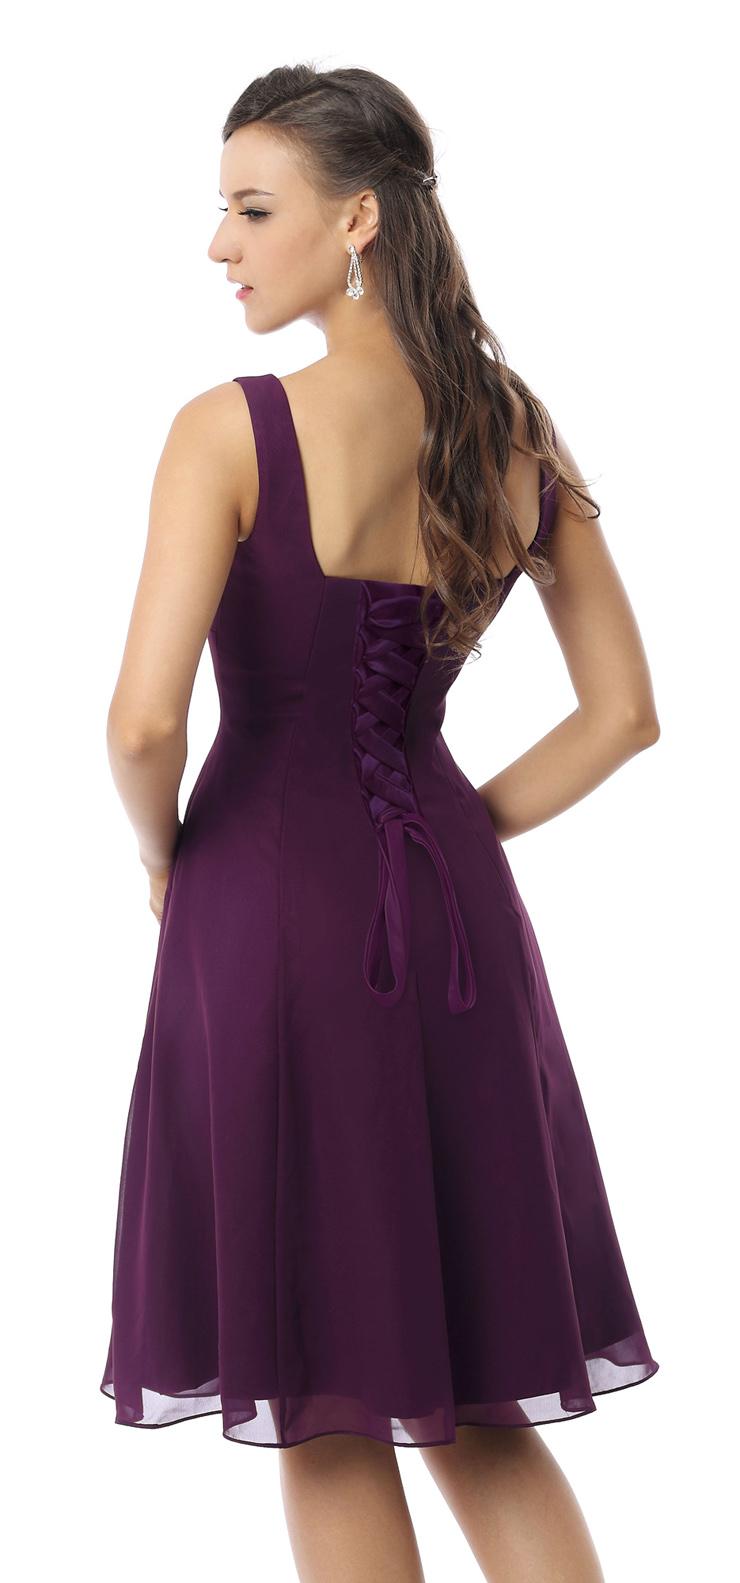 2017 Vintage Purple A-line Straps Square Neckline Empire Knee-Length Prom/Homecoming Dresses F30049